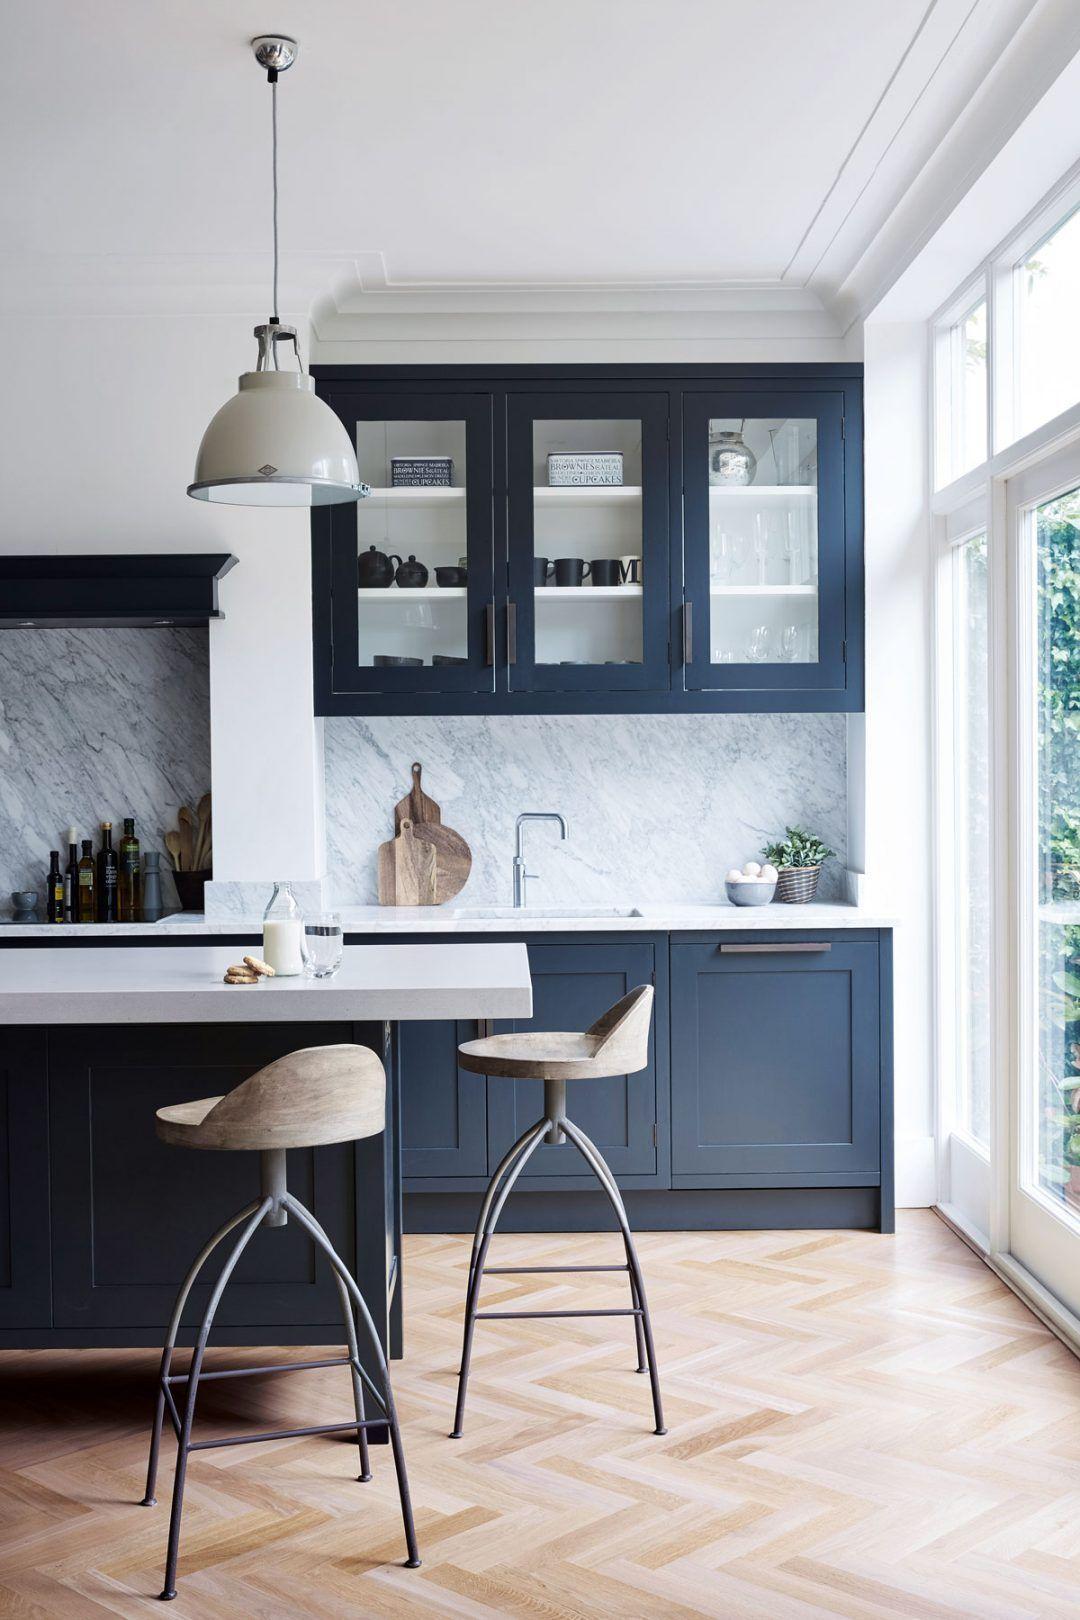 #rustic kitchen decor #french kitchen decor #cute kitchen decor #mickey mouse kitchen decor #country french kitchen decor #kitchen decor at walmart #kitchen decor #italy kitchen decor